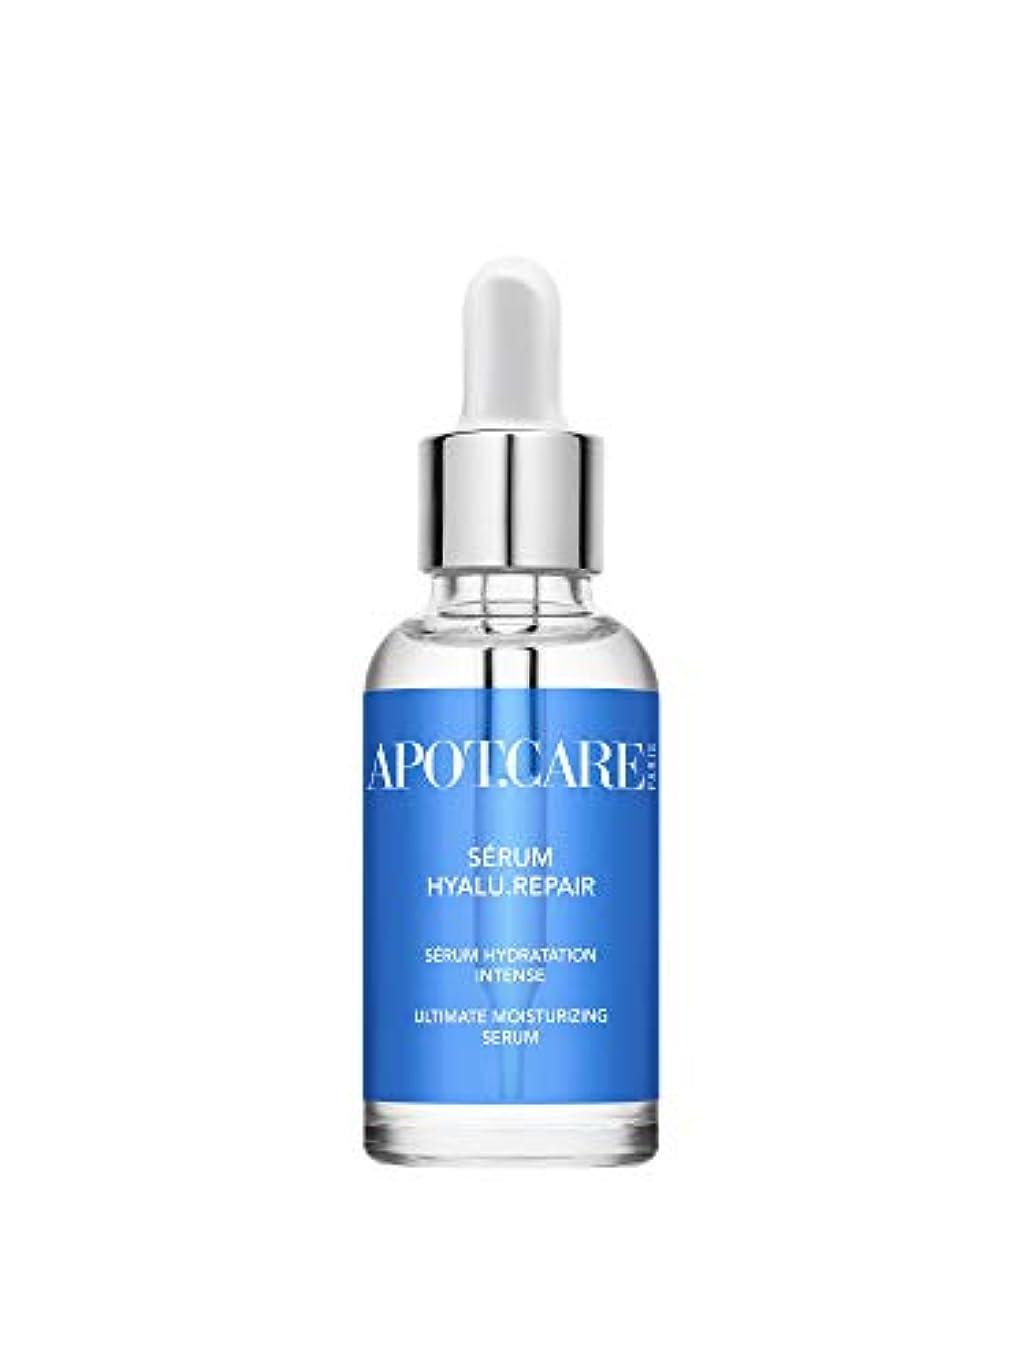 Apot.Care HYALURONIC Pure Serum - Hydration 10ml/0.34oz並行輸入品